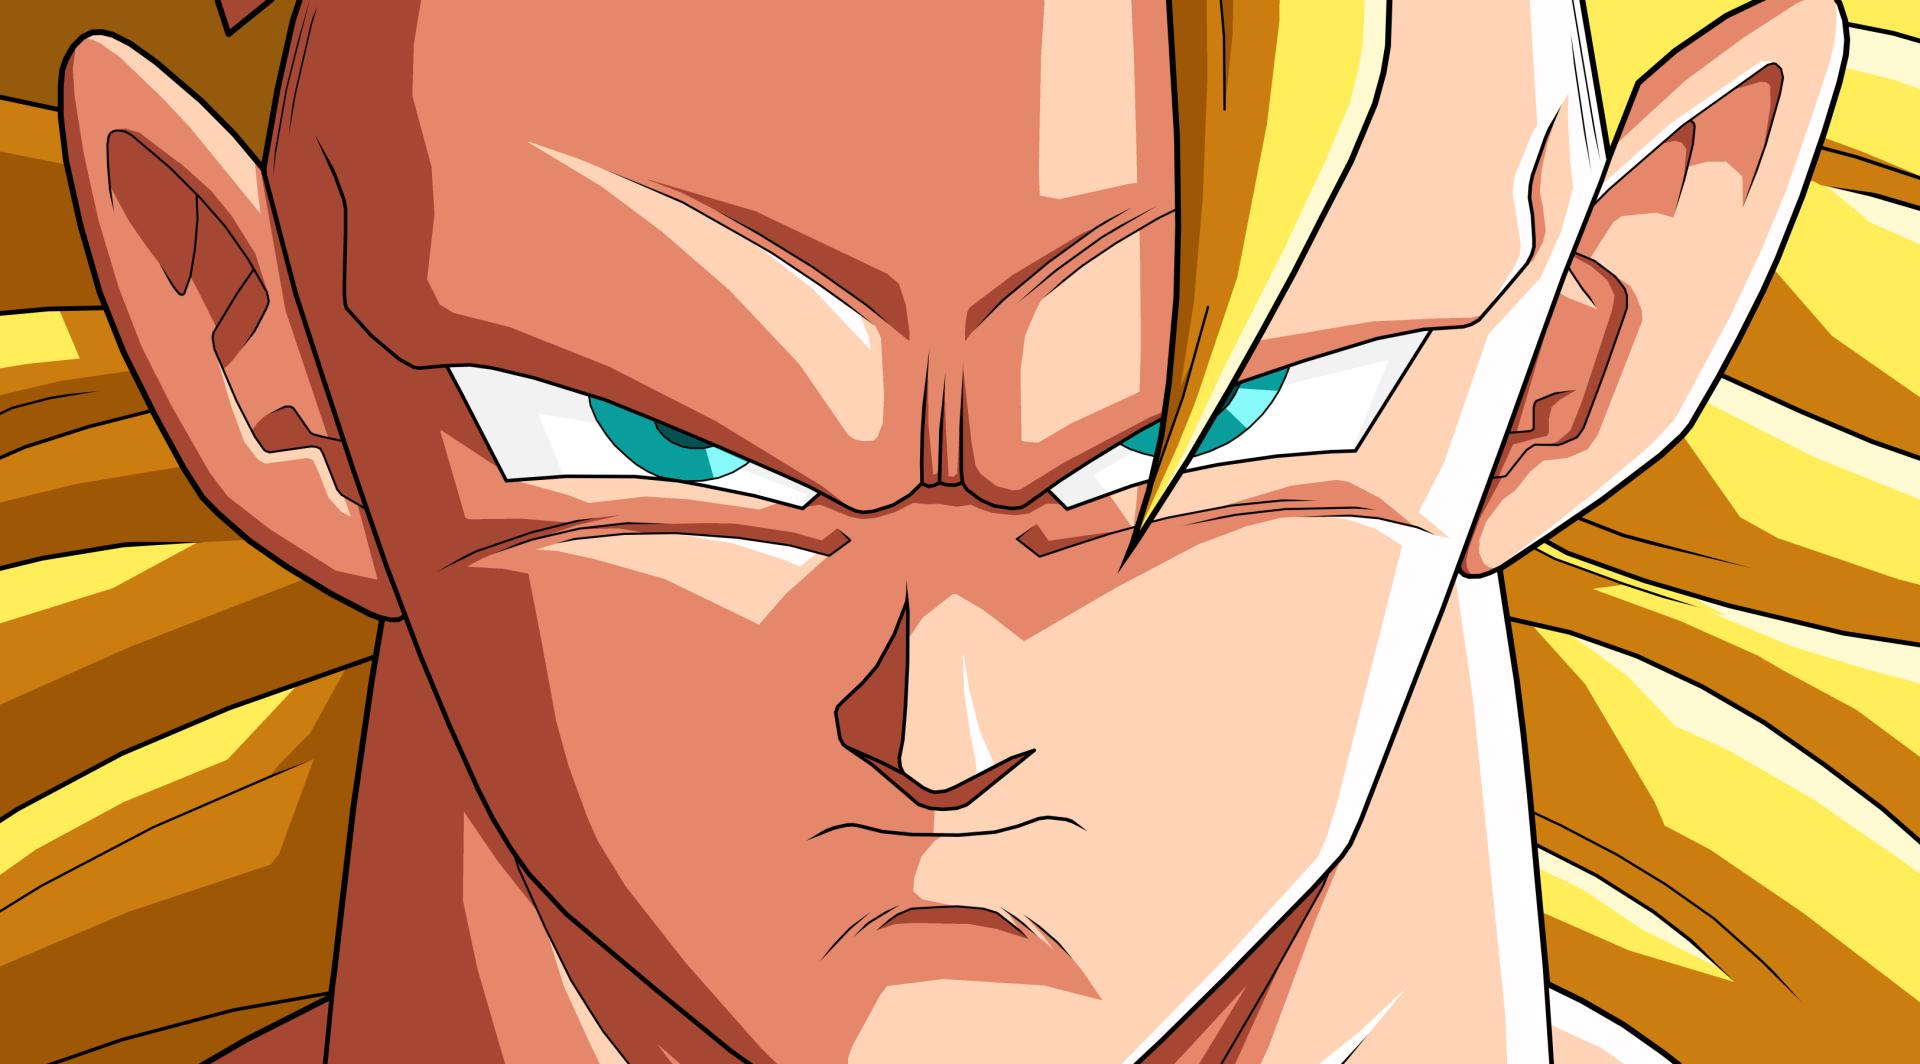 Goku And Vegeta Full Hd Fondo De Pantalla And Fondo De: Goku SSJ3 Full HD Fondo De Pantalla And Fondo De